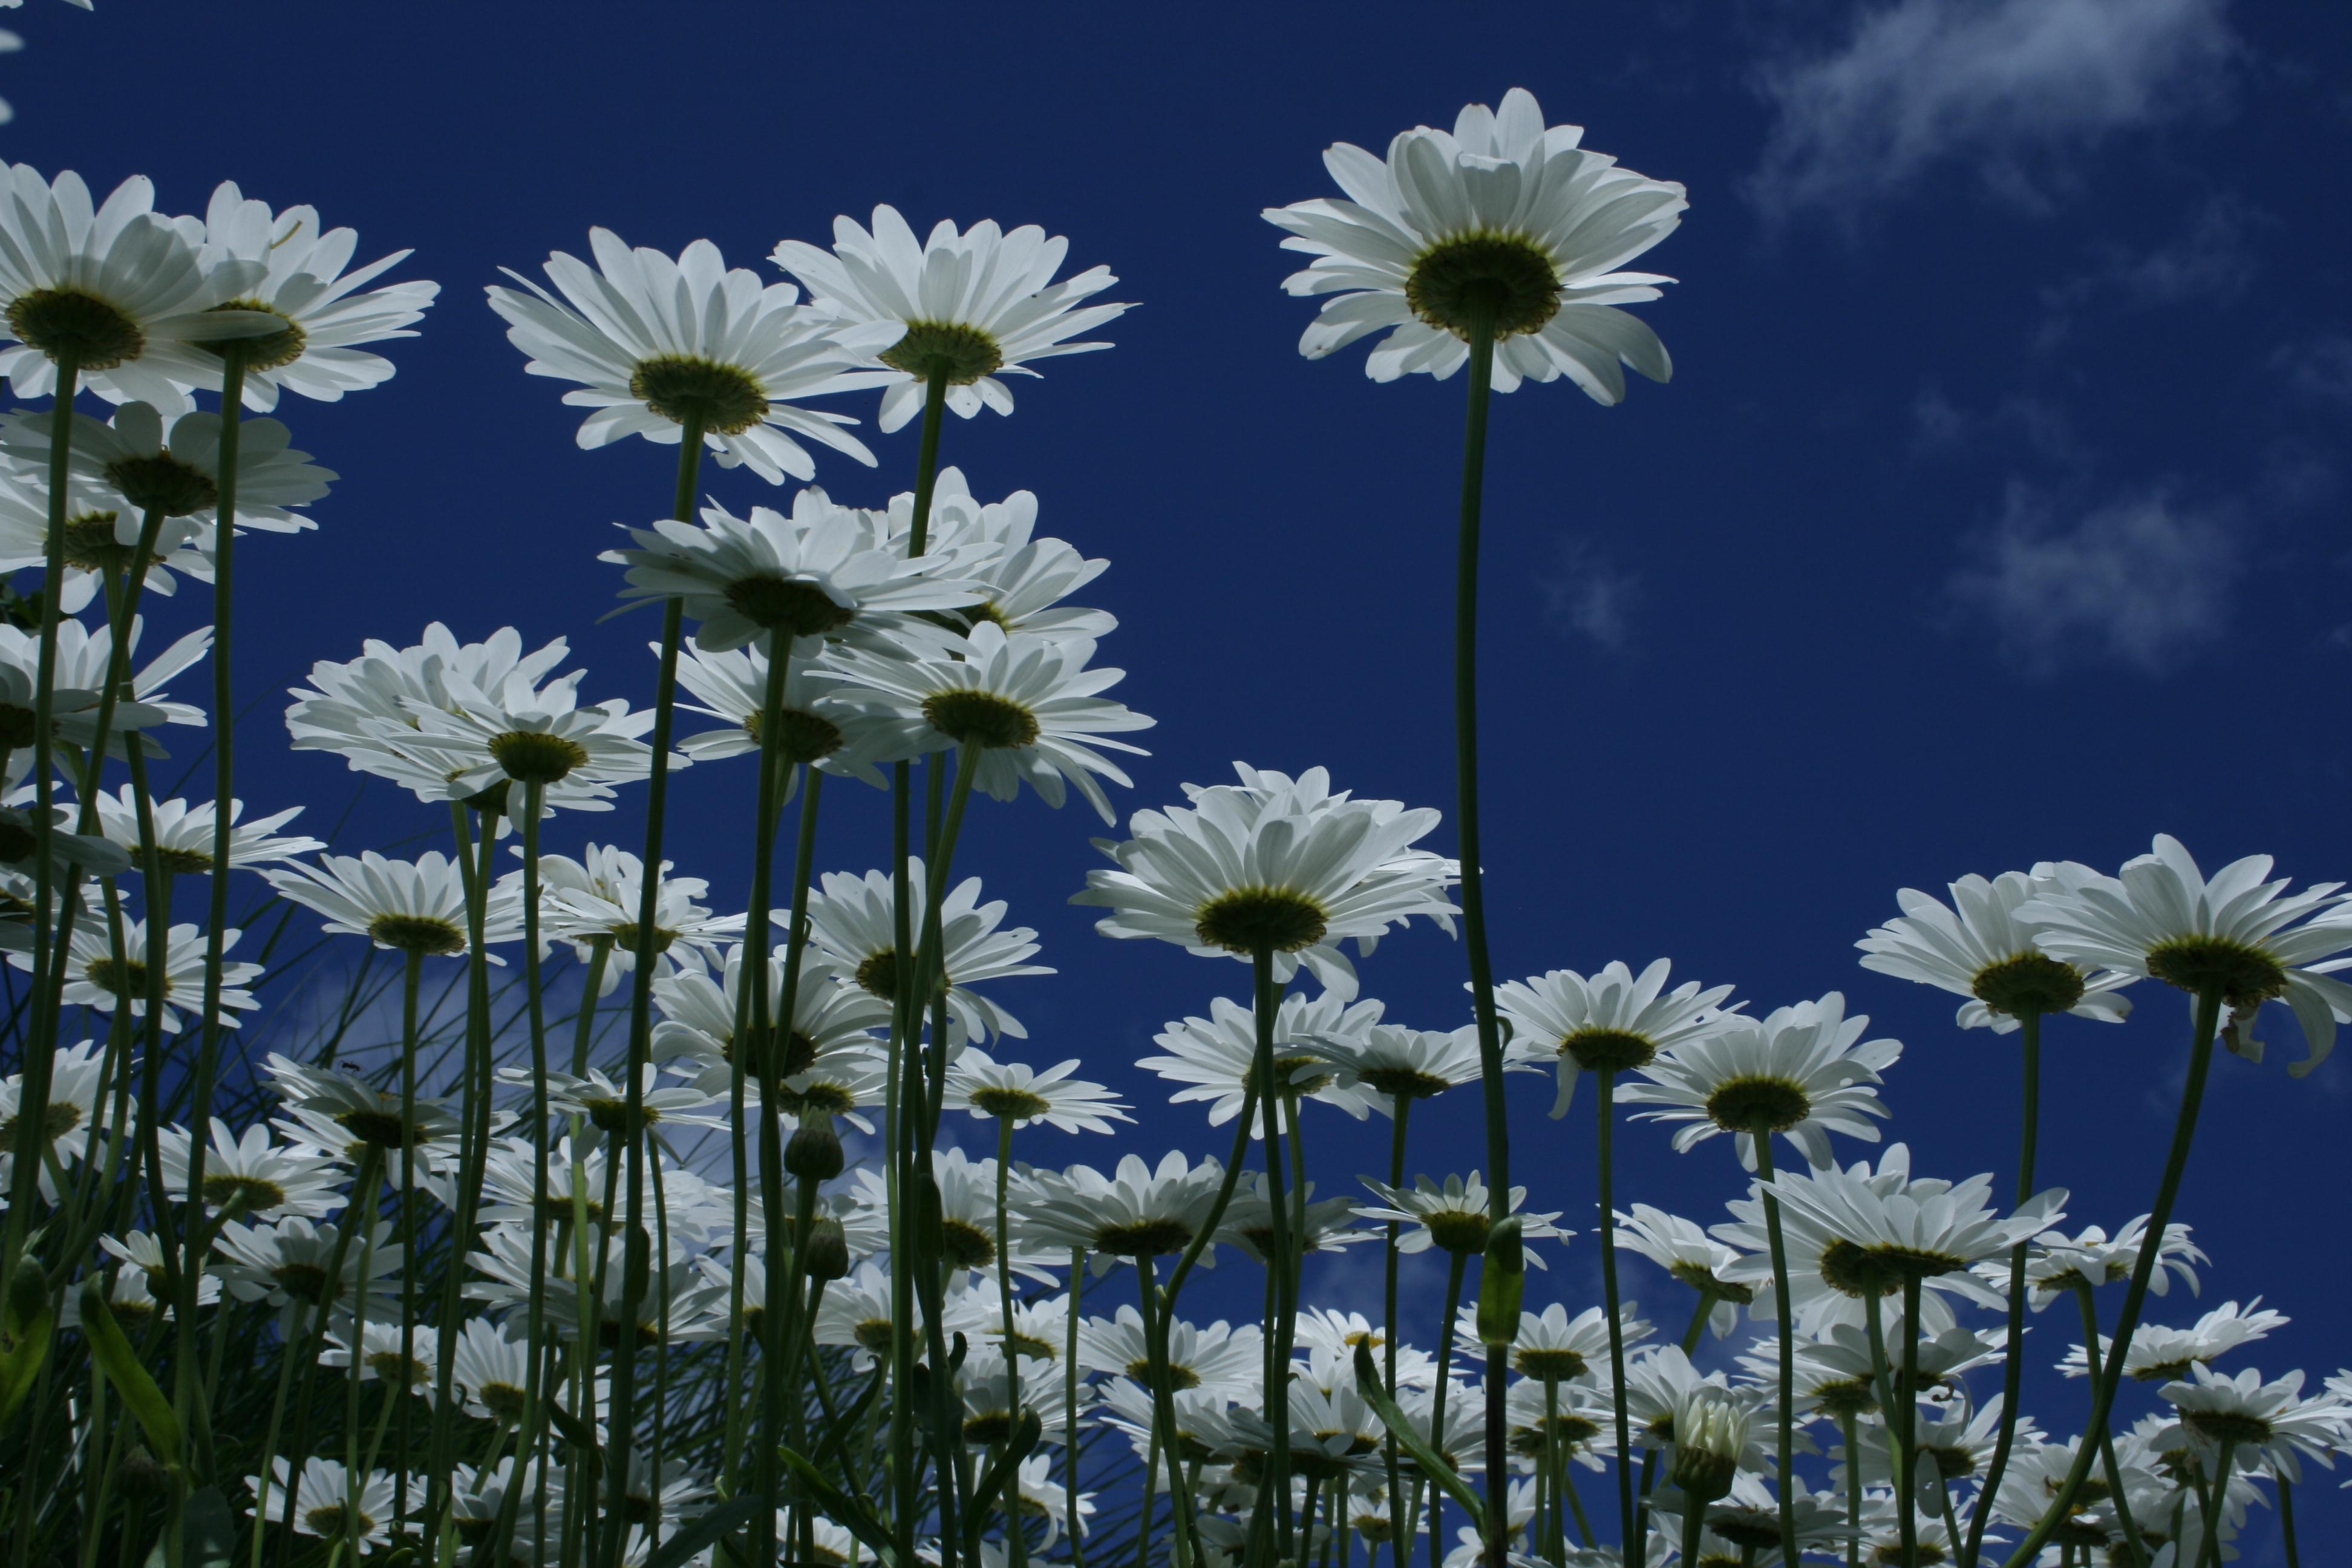 Dancing daisies 75 la arts dancing daisies 75 izmirmasajfo